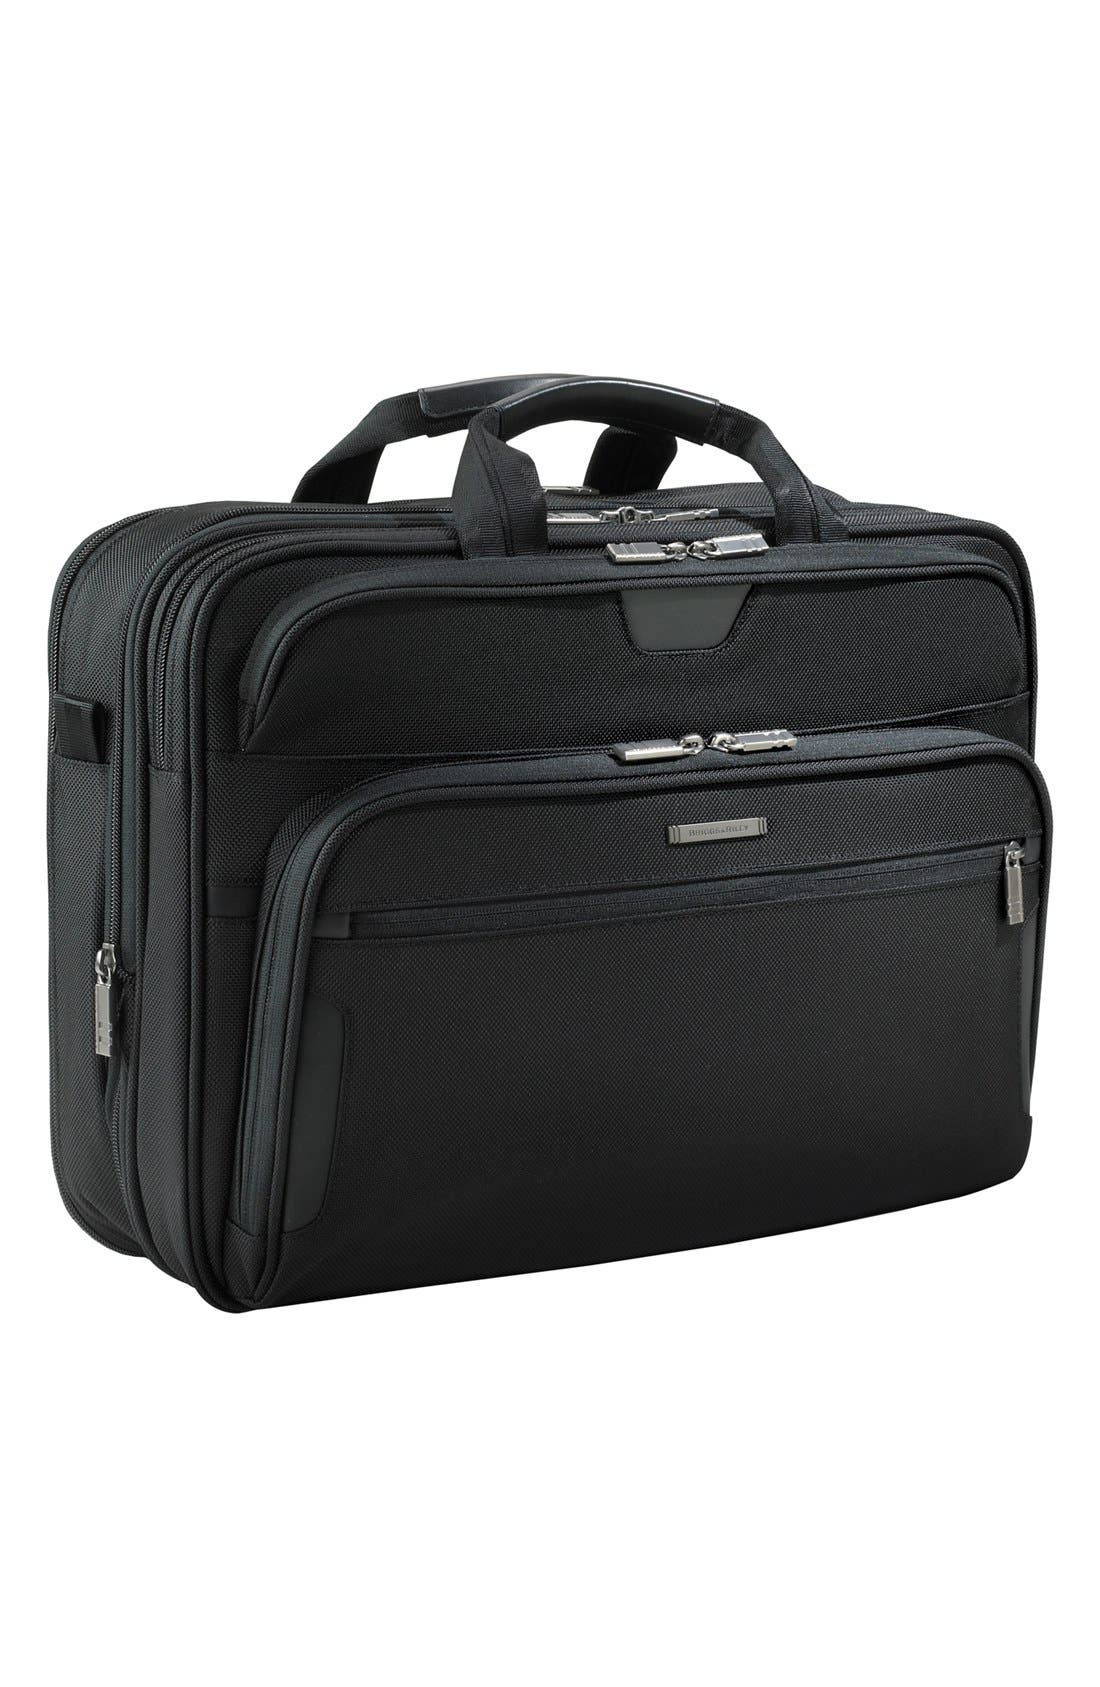 BRIGGS & RILEY Large Ballistic Nylon Expandable Briefcase